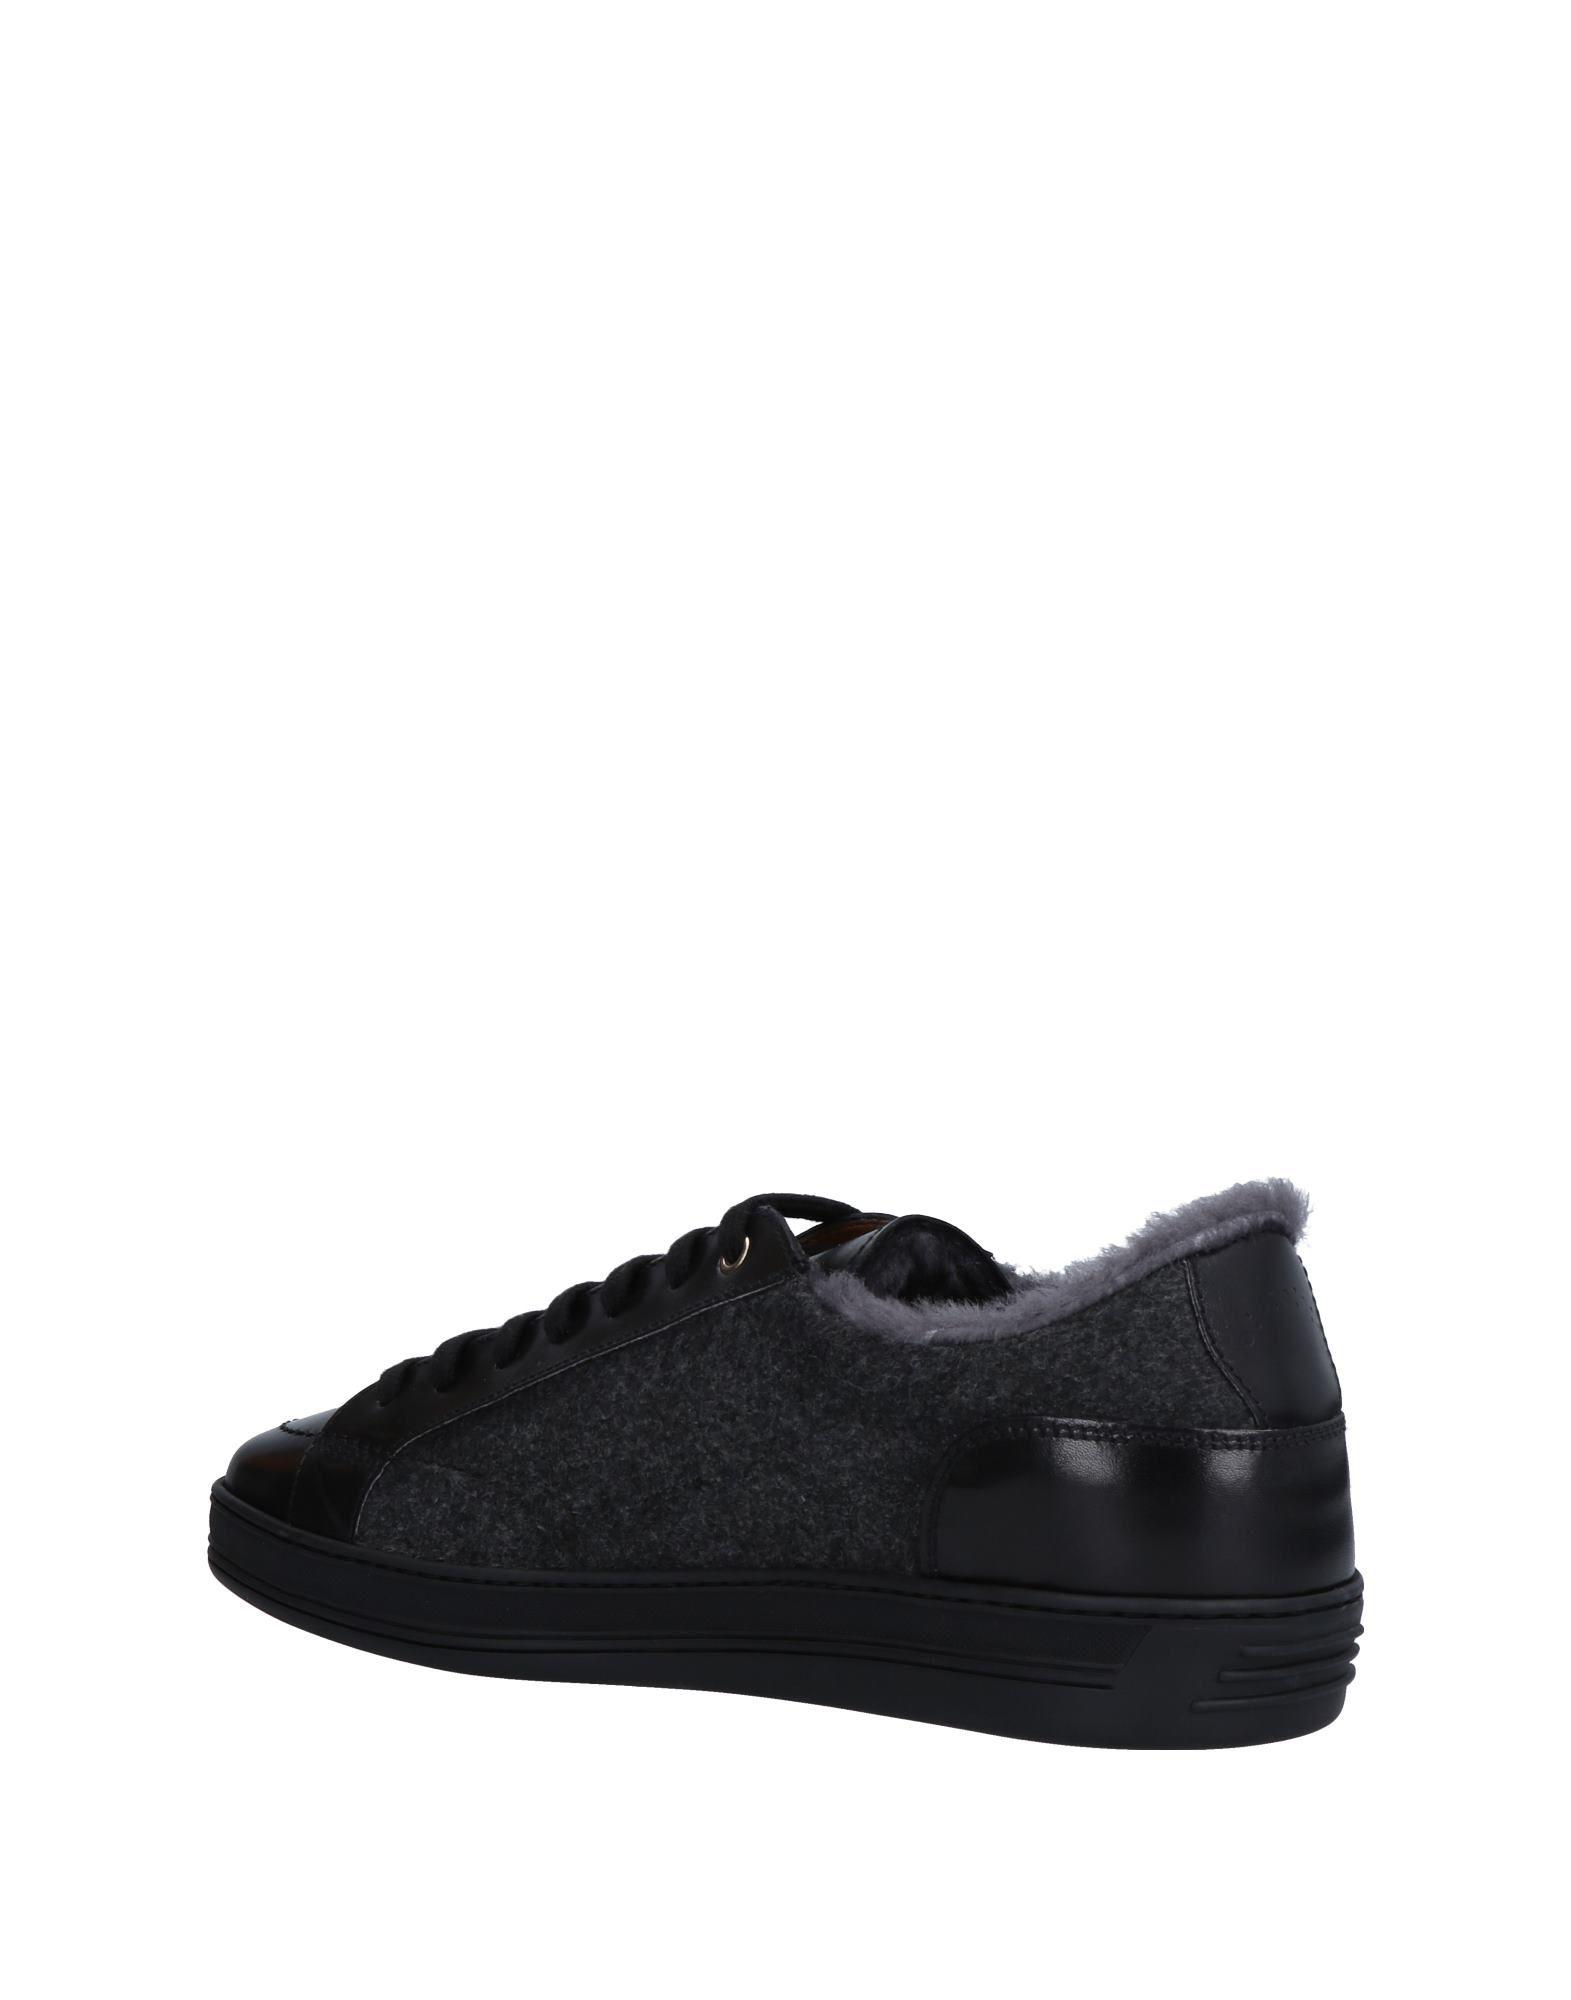 Doucal's Sneakers Herren  beliebte 11506713BR Gute Qualität beliebte  Schuhe 5805b3